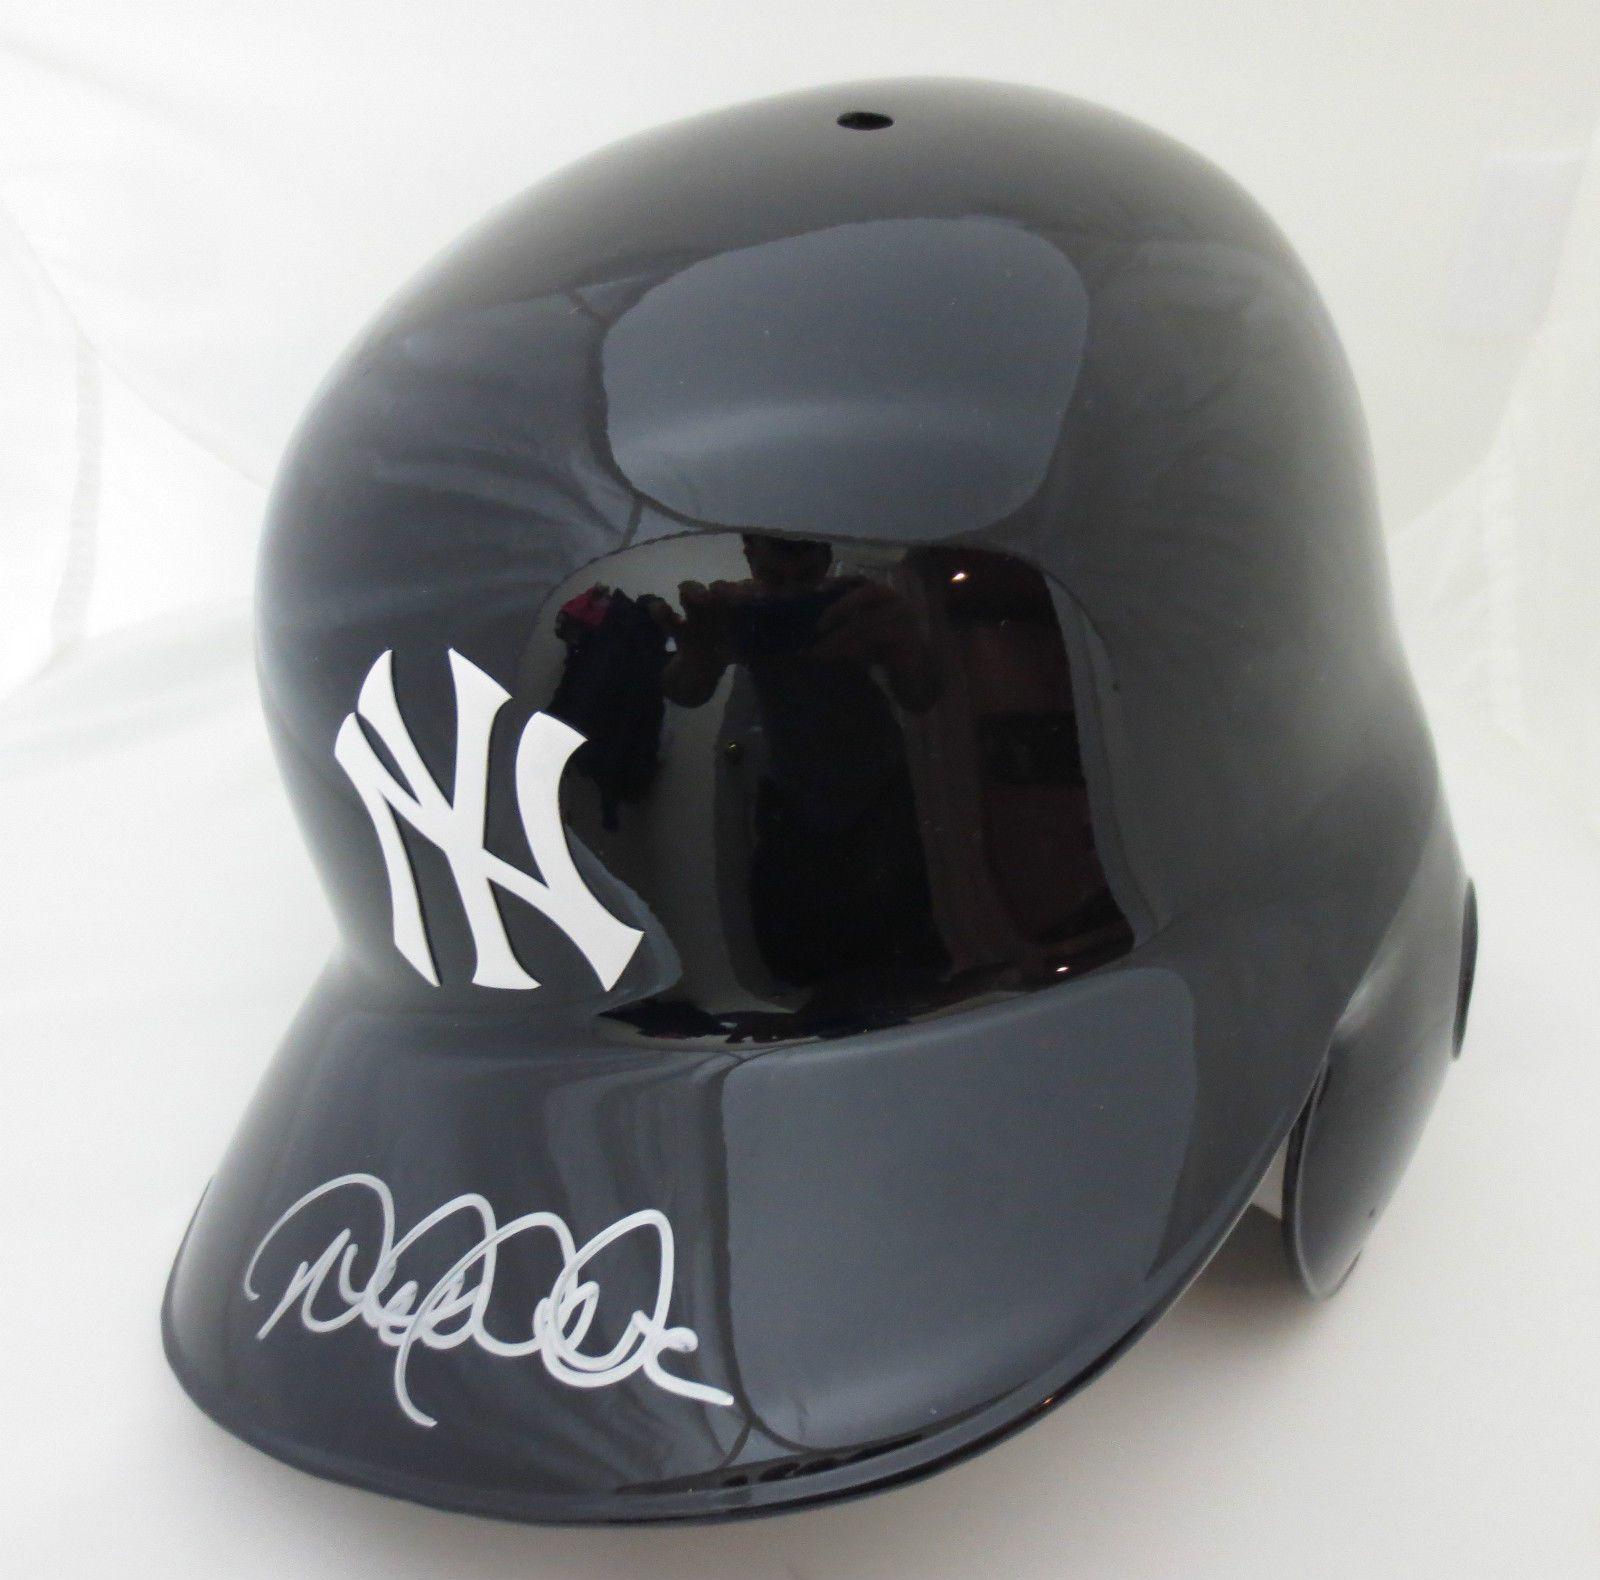 Derek Jeter Autographed New York Yankees Baseball Batting Helmet Steiner Coa New York Yankees Baseball New York Yankees Ny Yankees